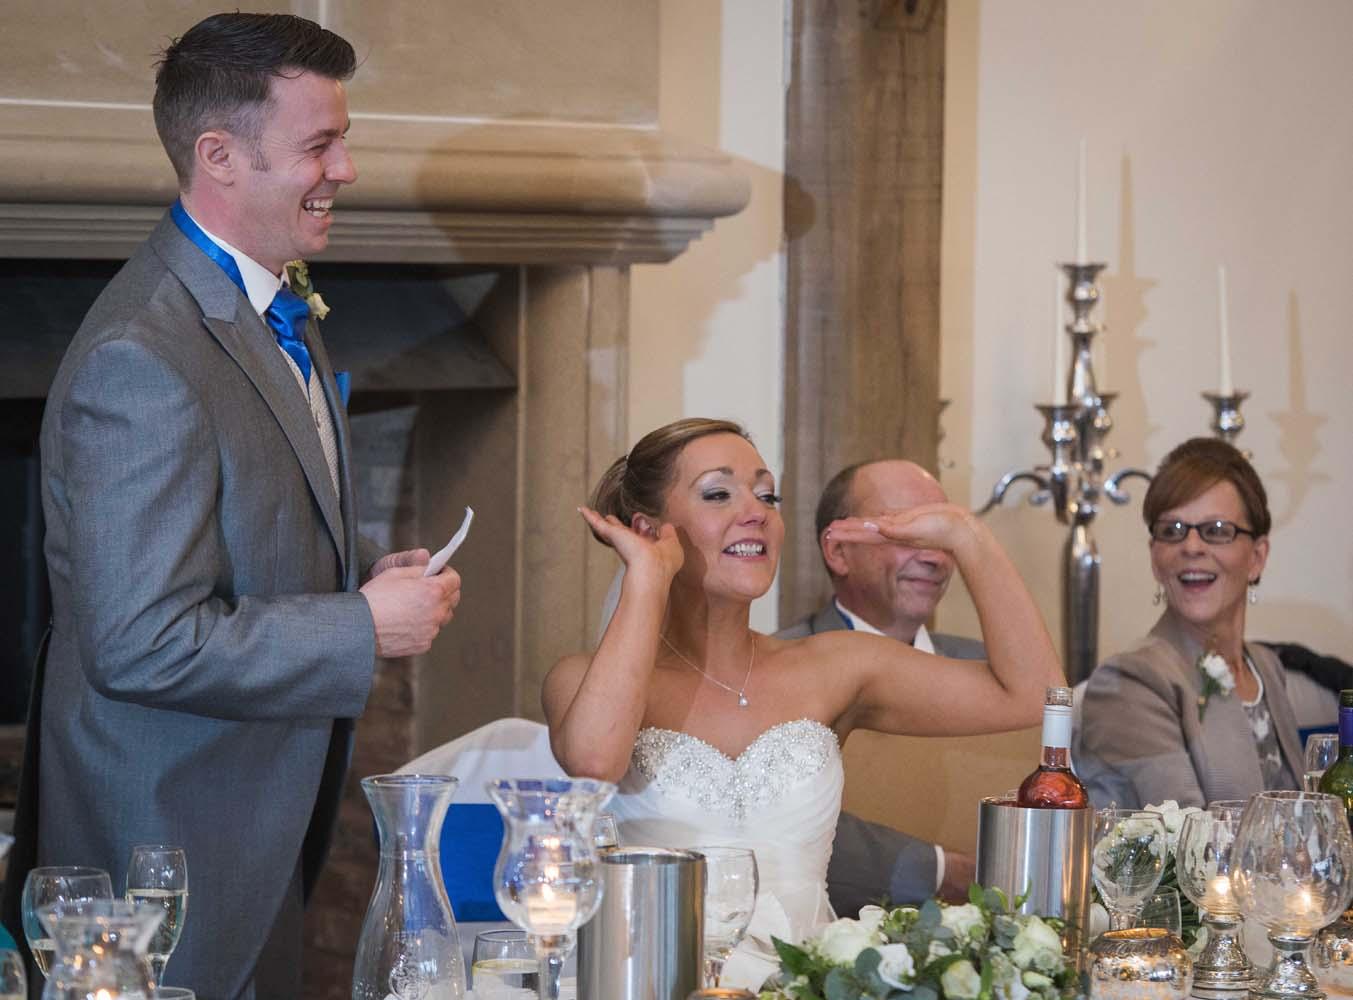 wedding photo 6 (6 of 10).jpg